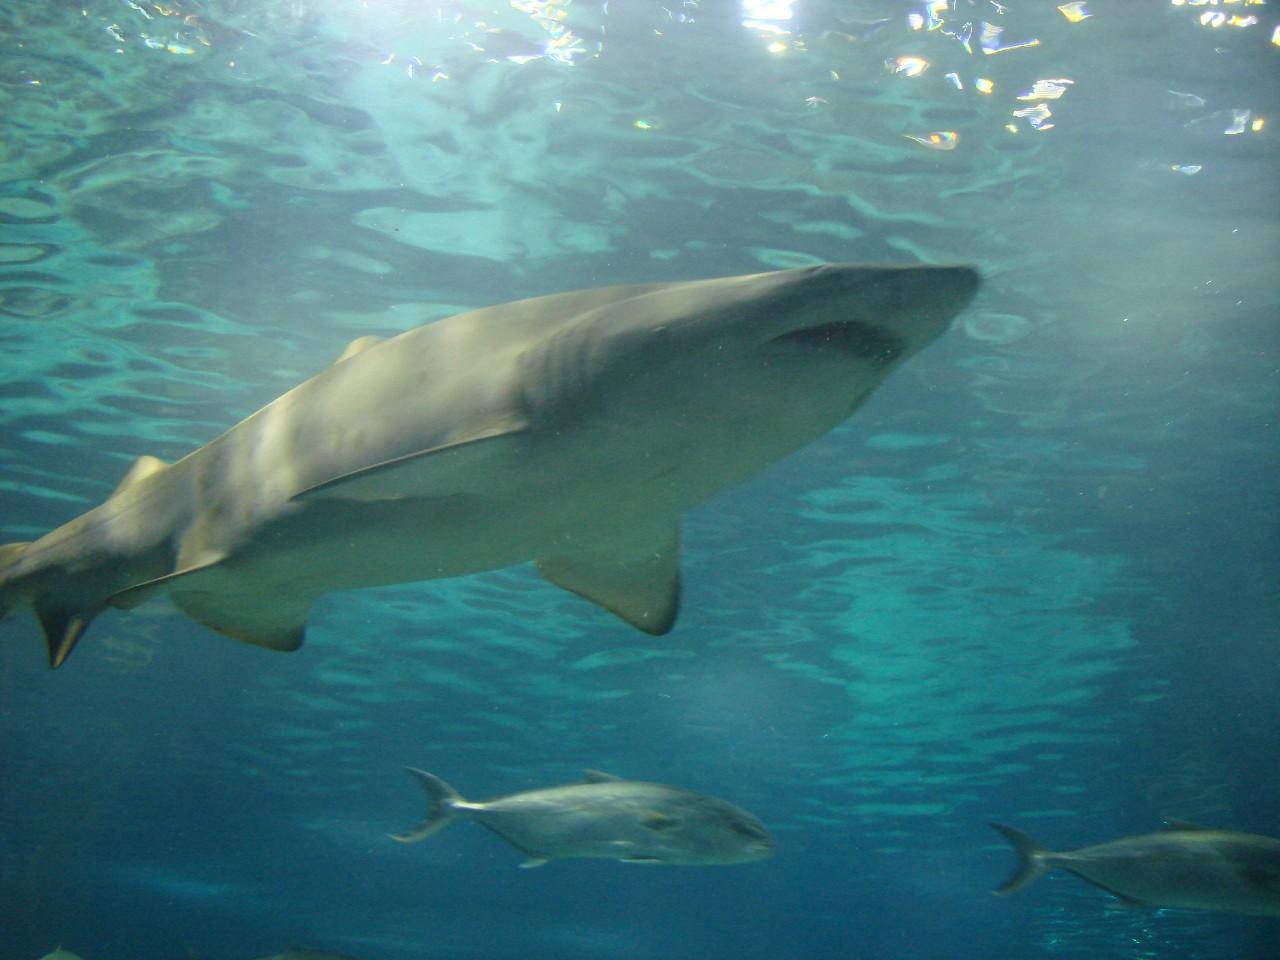 75% tiburones rayas oceánicas peligro extinción sobrepesca